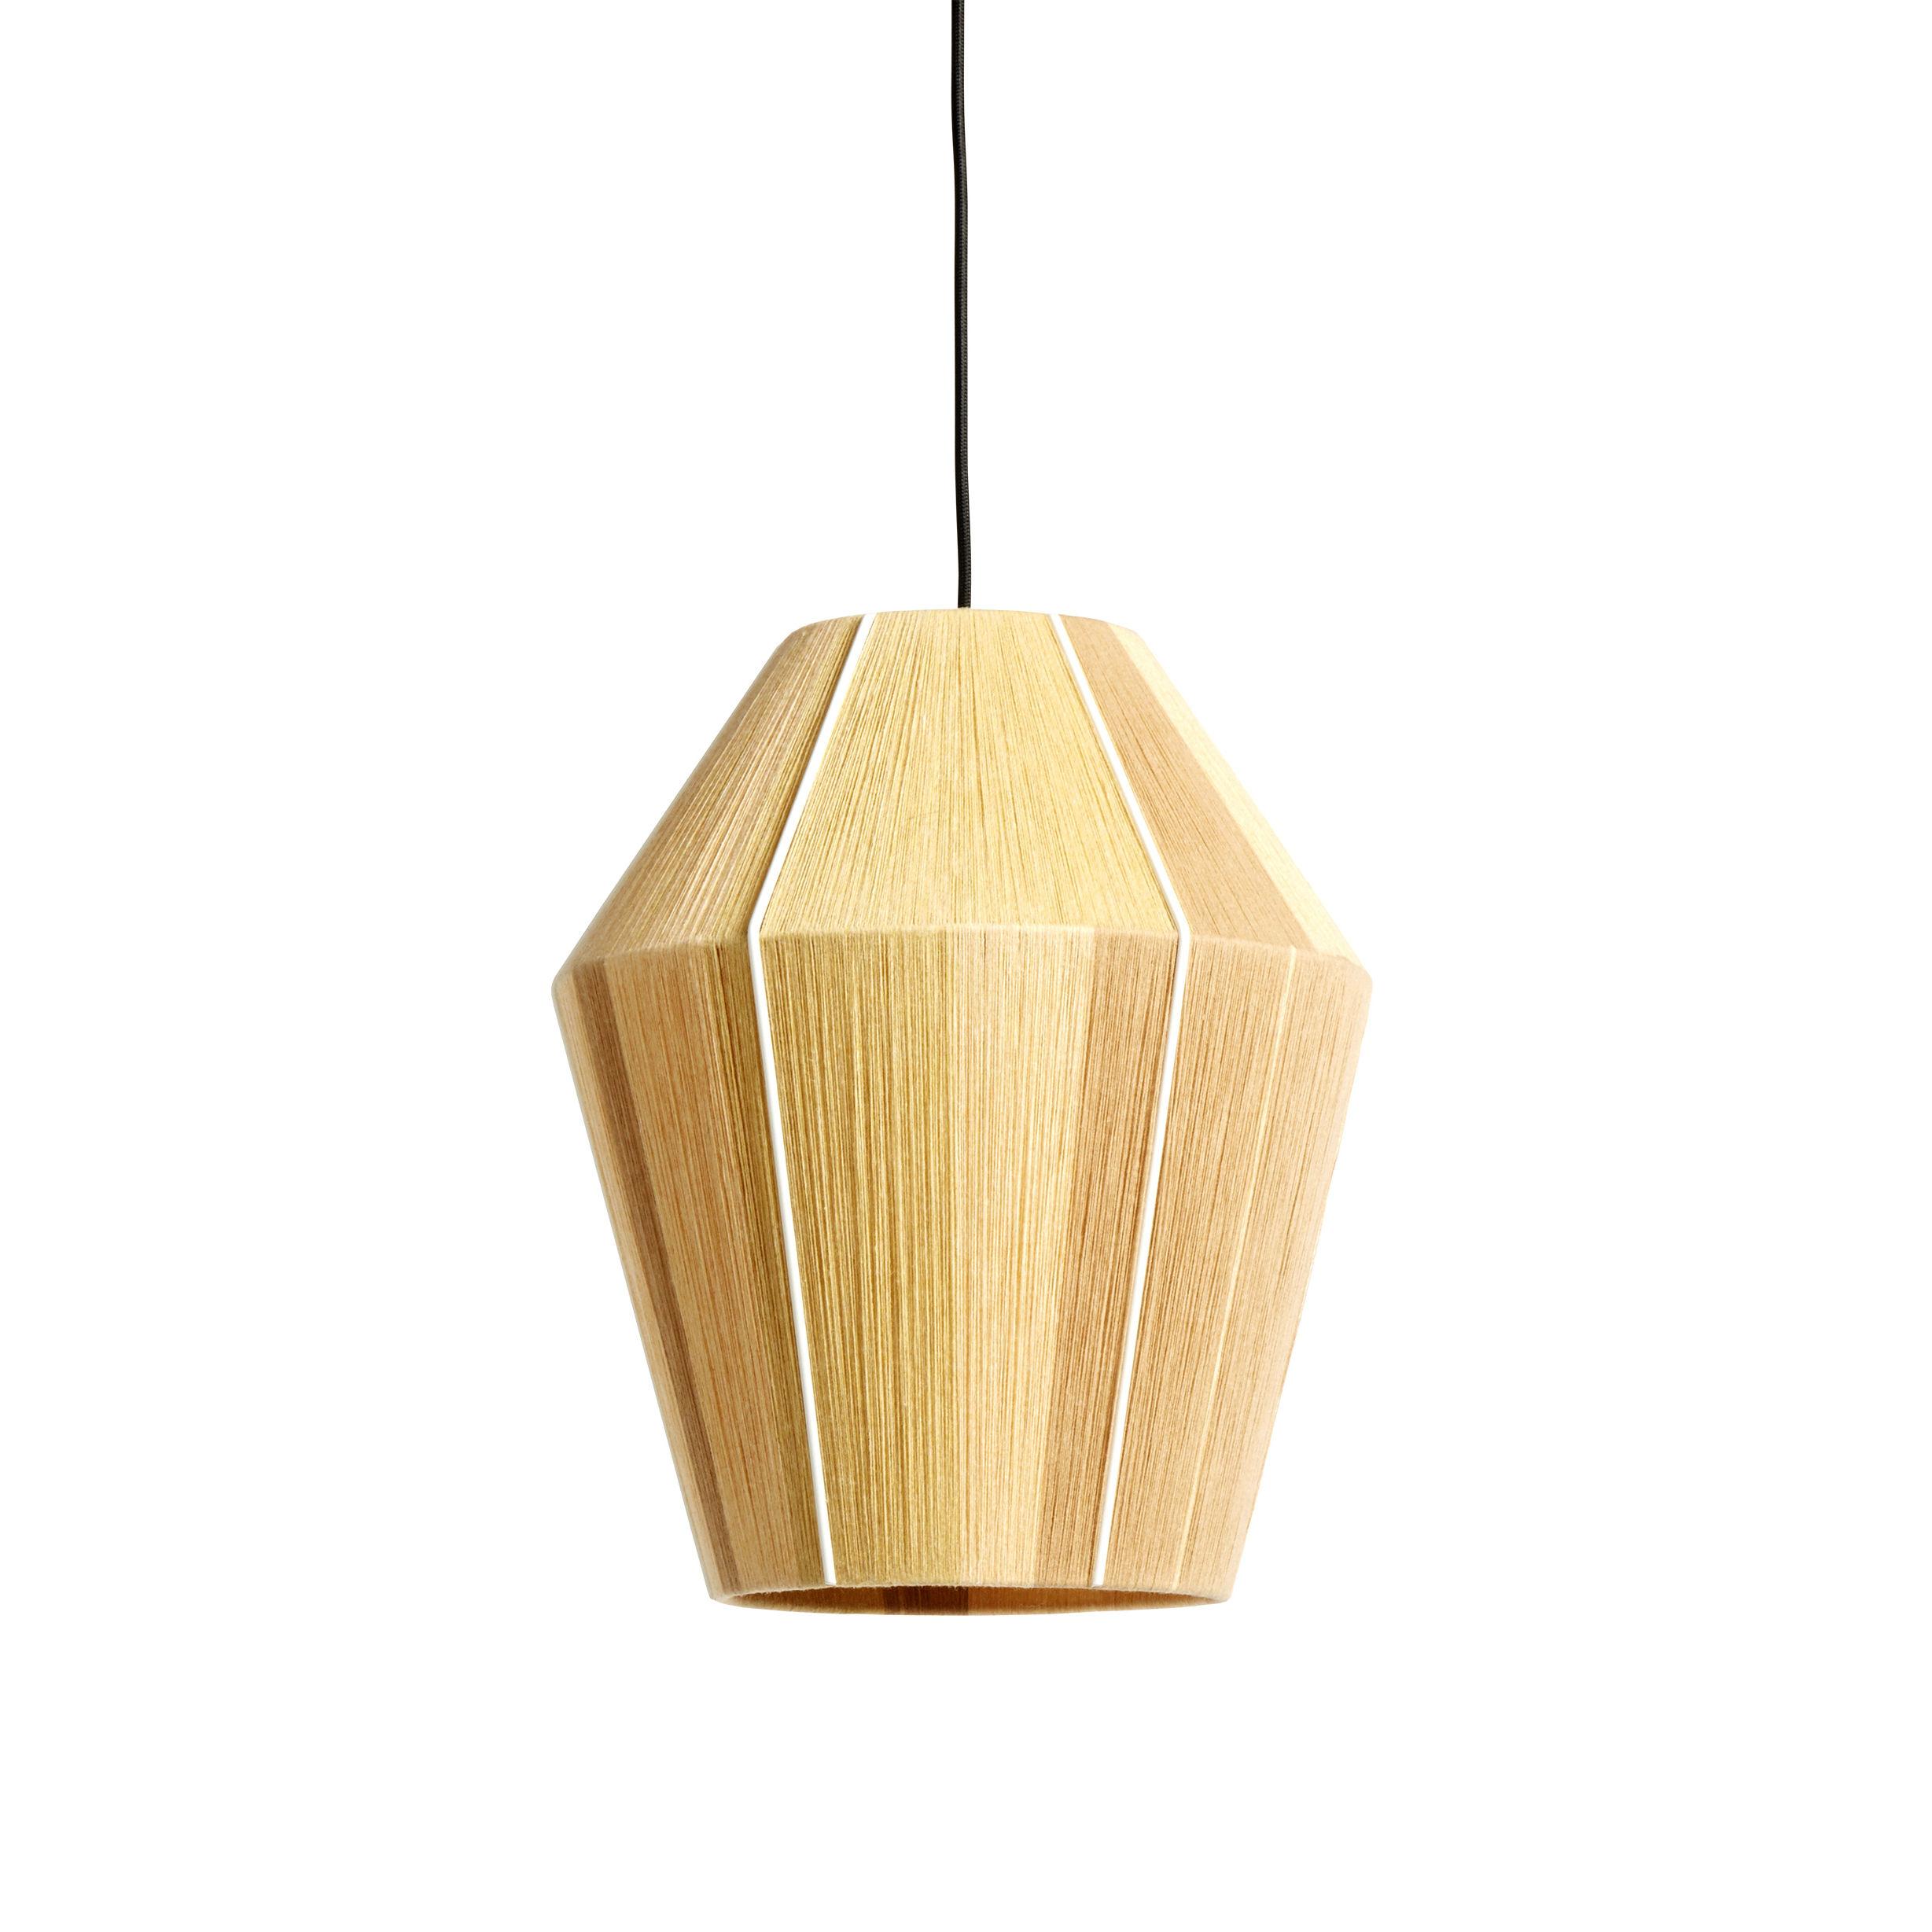 Illuminazione - Lampadari - Paralume Bonbon Small - / Ø 32 - Lana tessuta a mano di Hay - Small / Giallo - Acciaio, Lana, Nylon